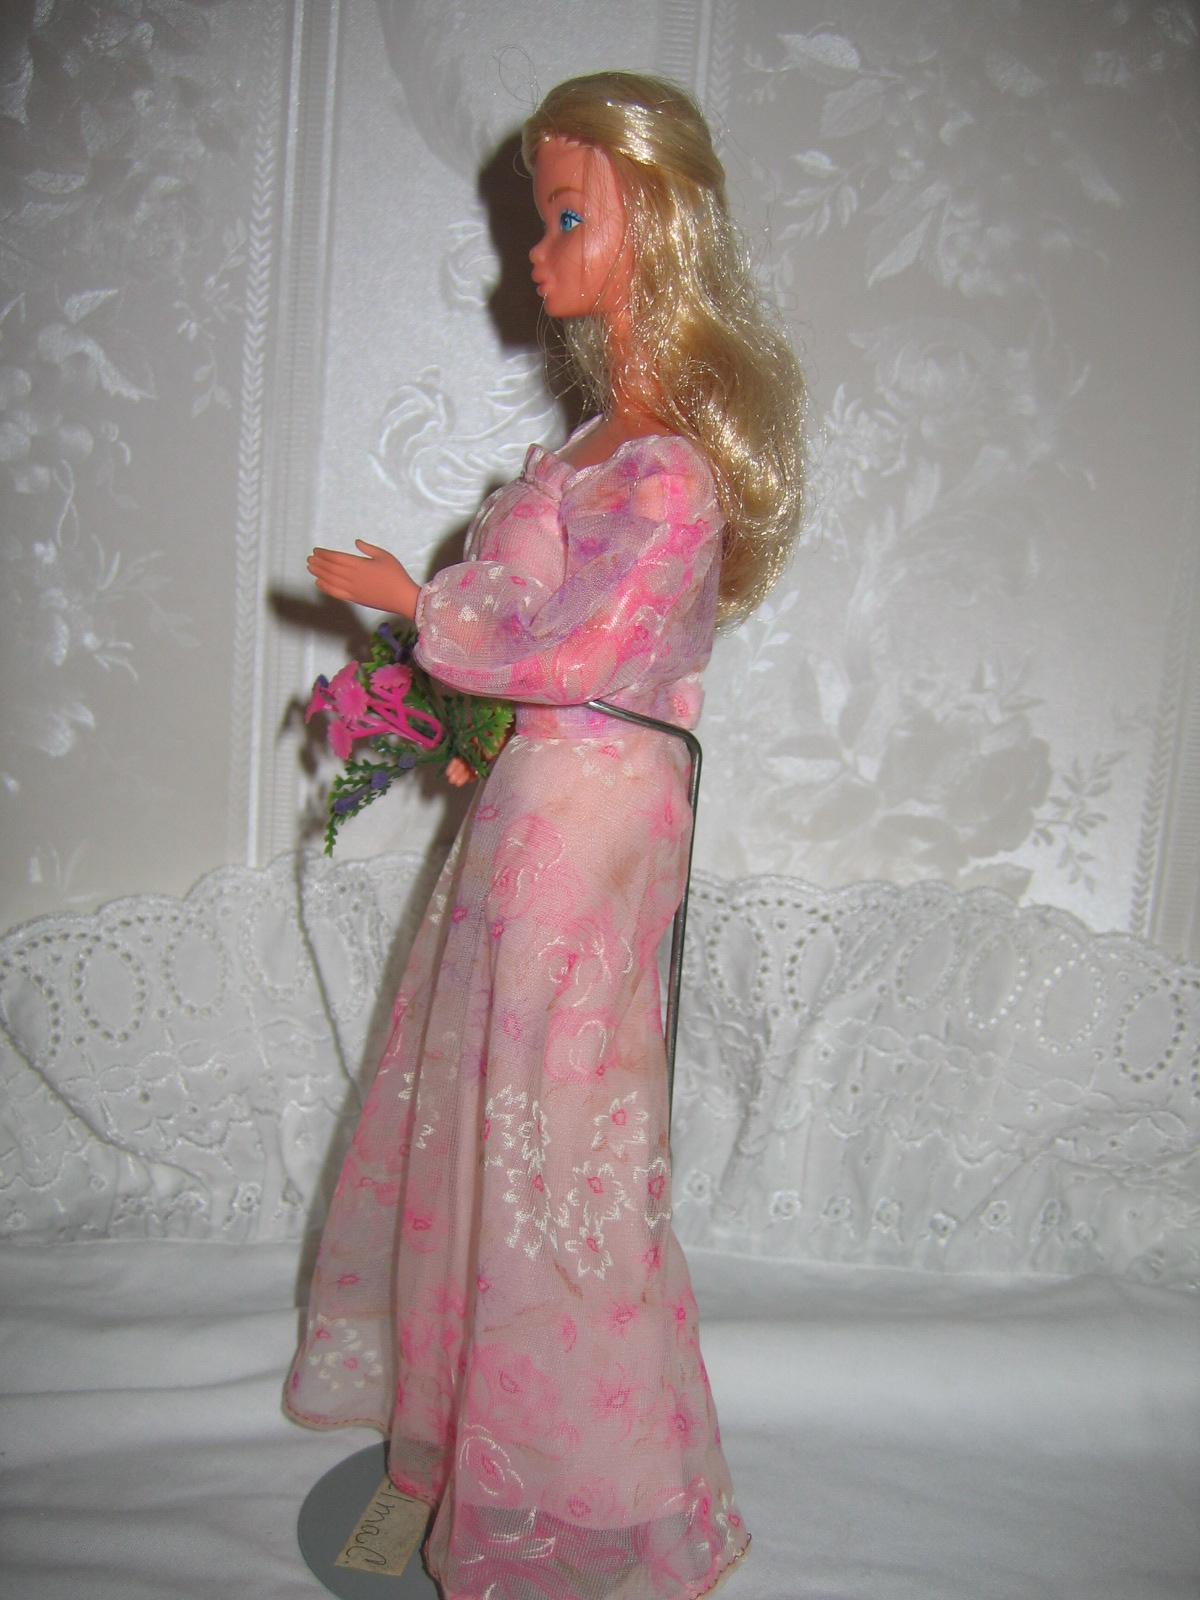 vintage barbie collectables